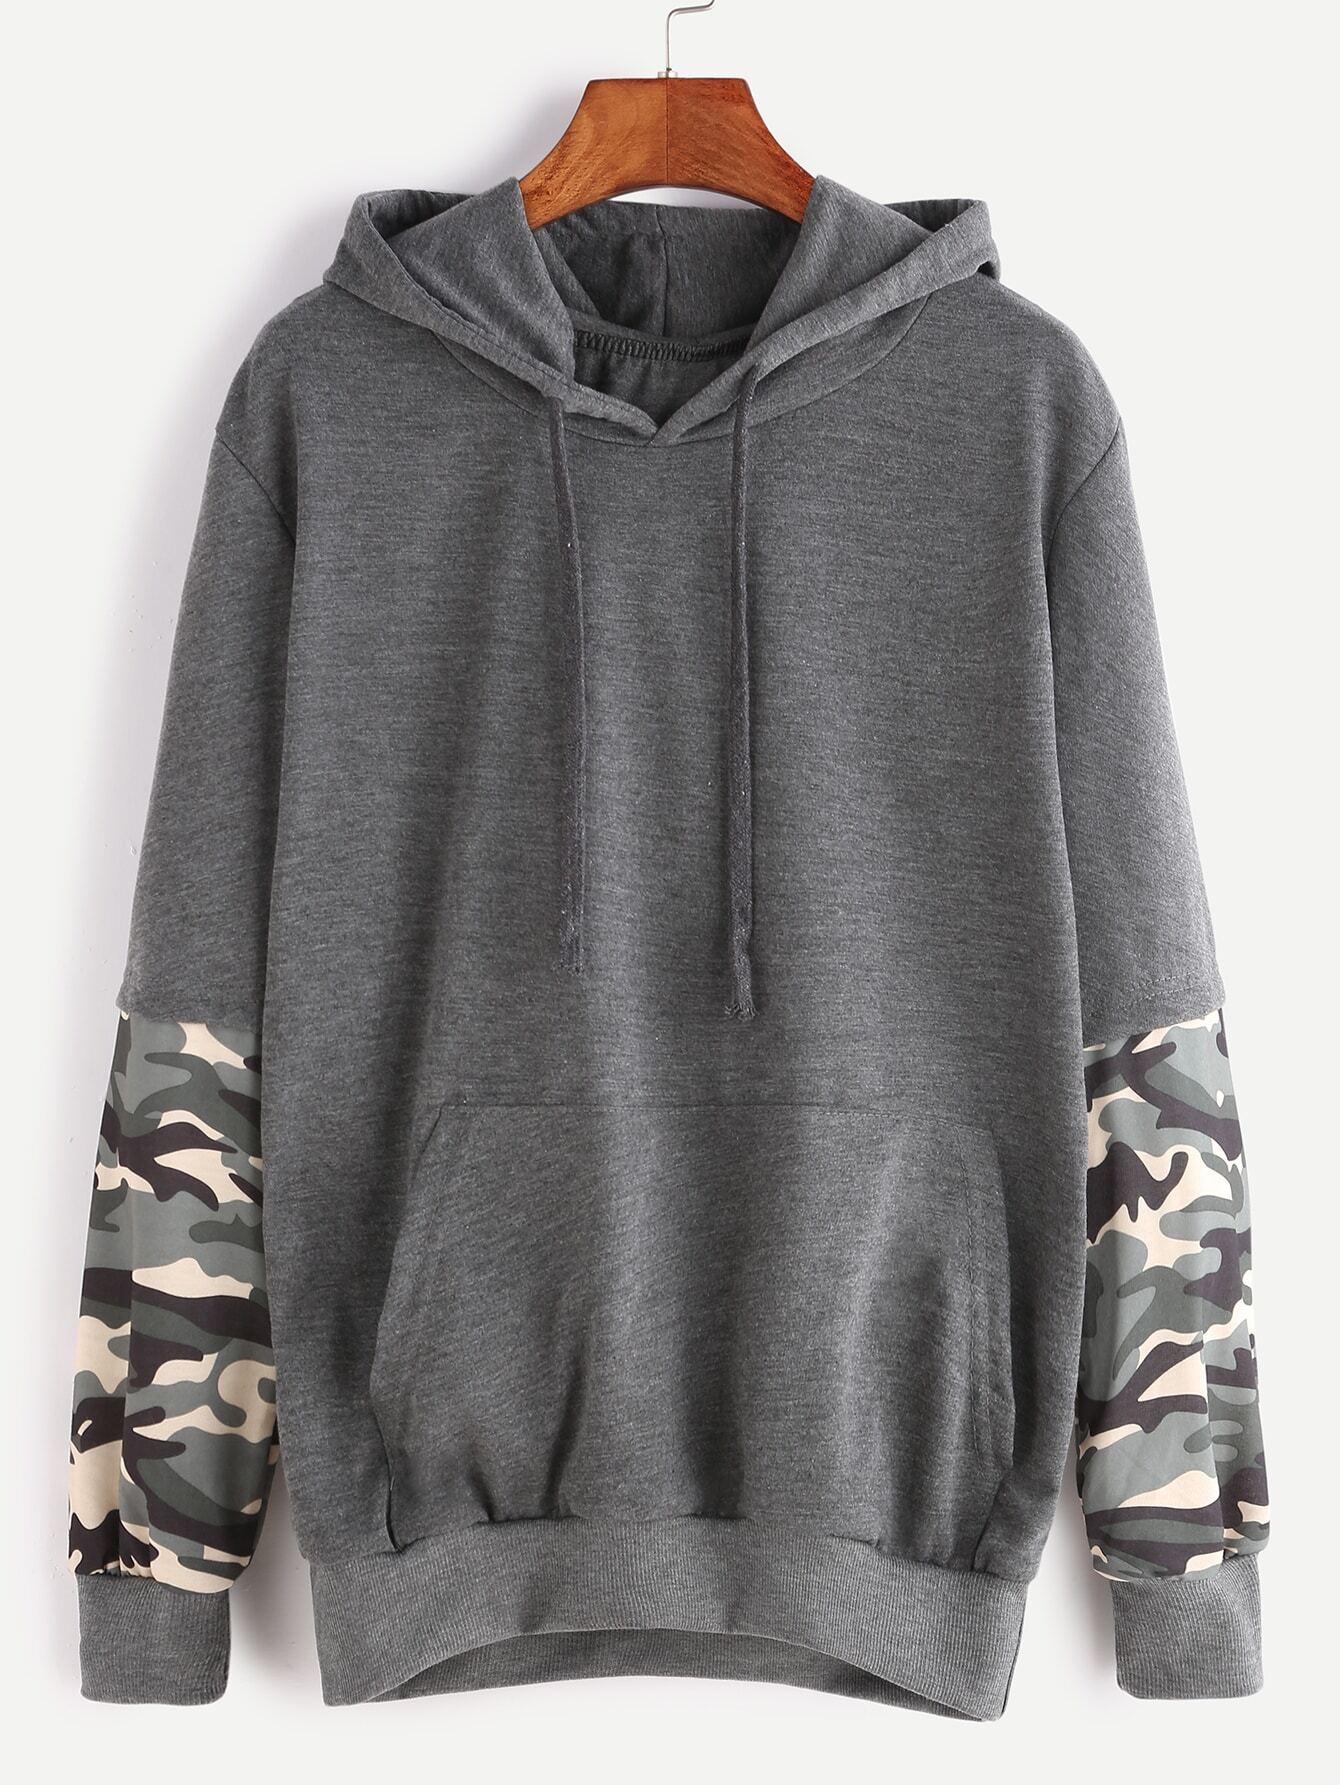 Dark Grey Hooded Contrast Camo Print Sleeve Pocket SweatshirtDark Grey Hooded Contrast Camo Print Sleeve Pocket Sweatshirt<br><br>color: Grey<br>size: one-size